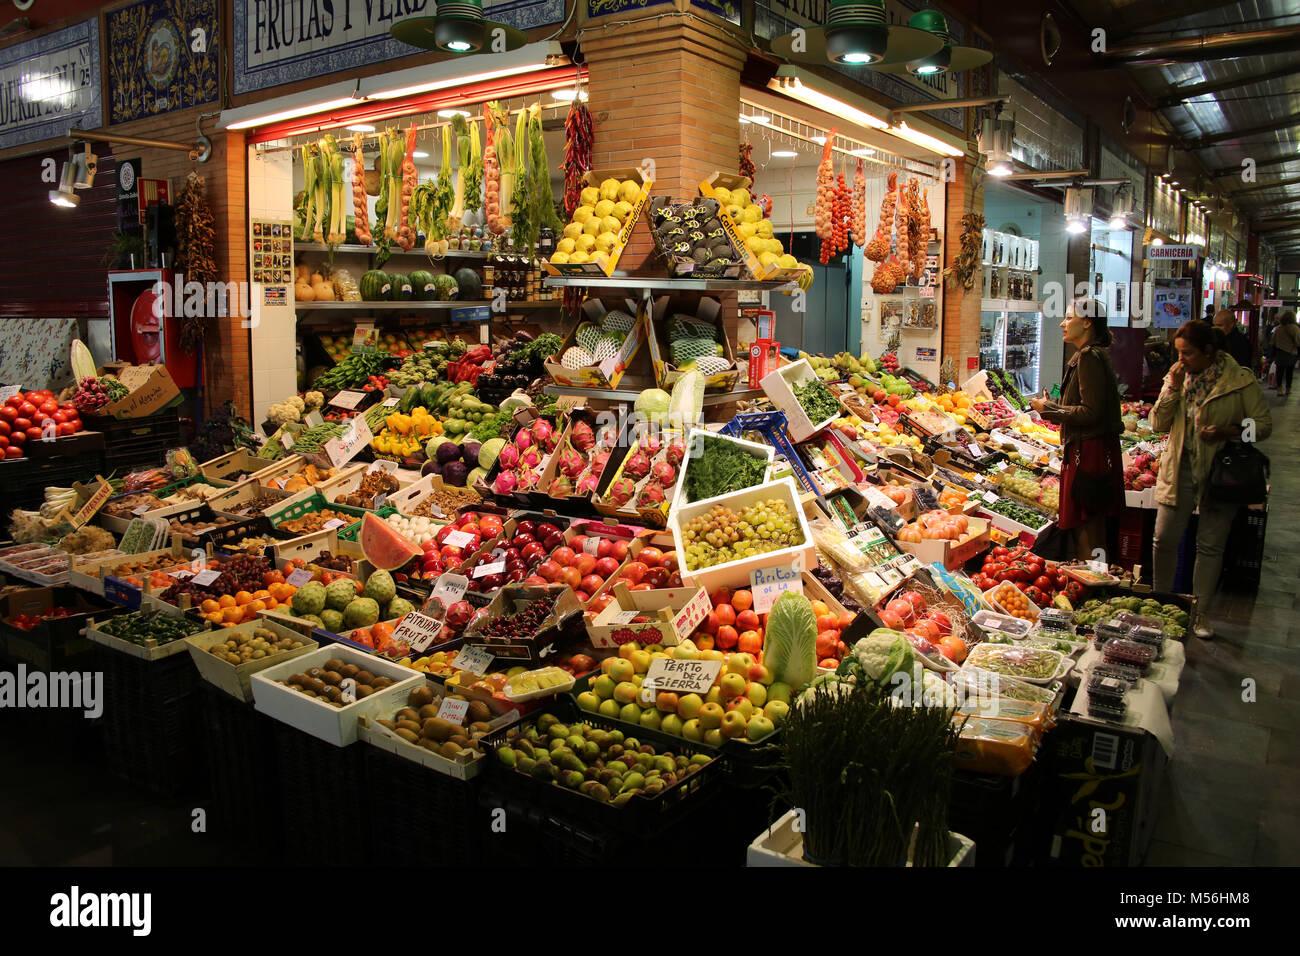 Market hall Mercado de Tirana - Stock Image